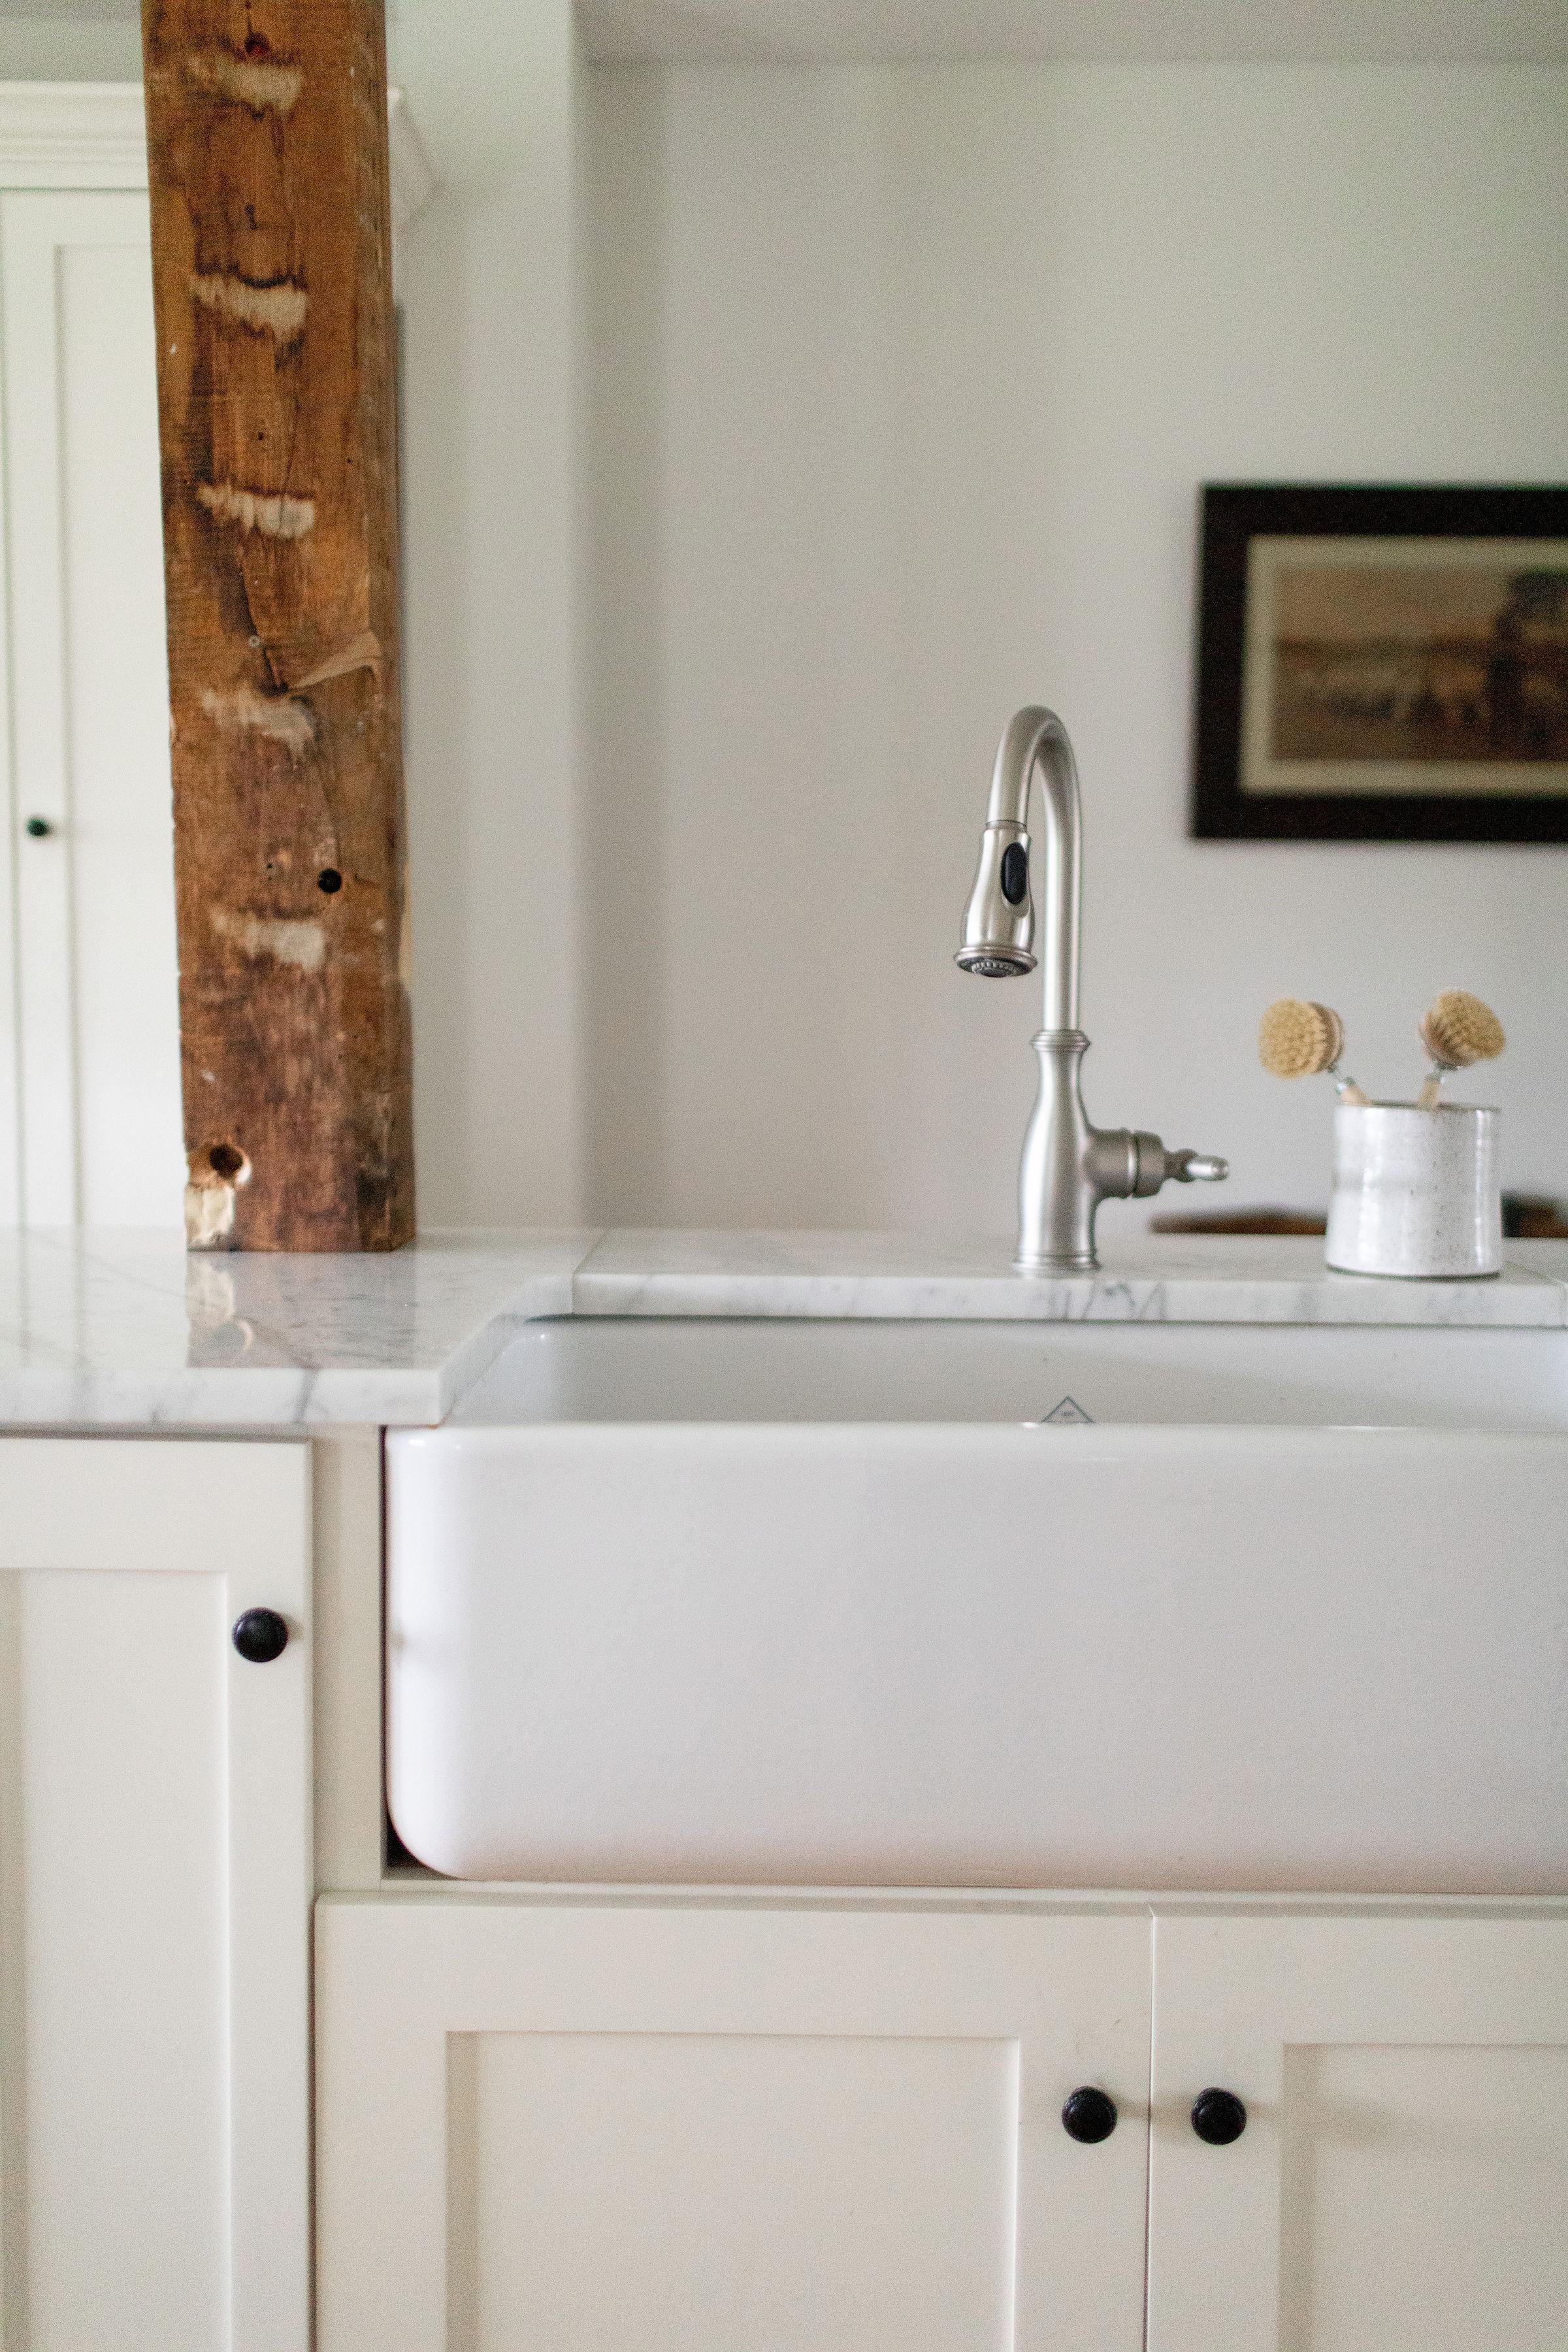 White kitchen with wood beam NY interior designer